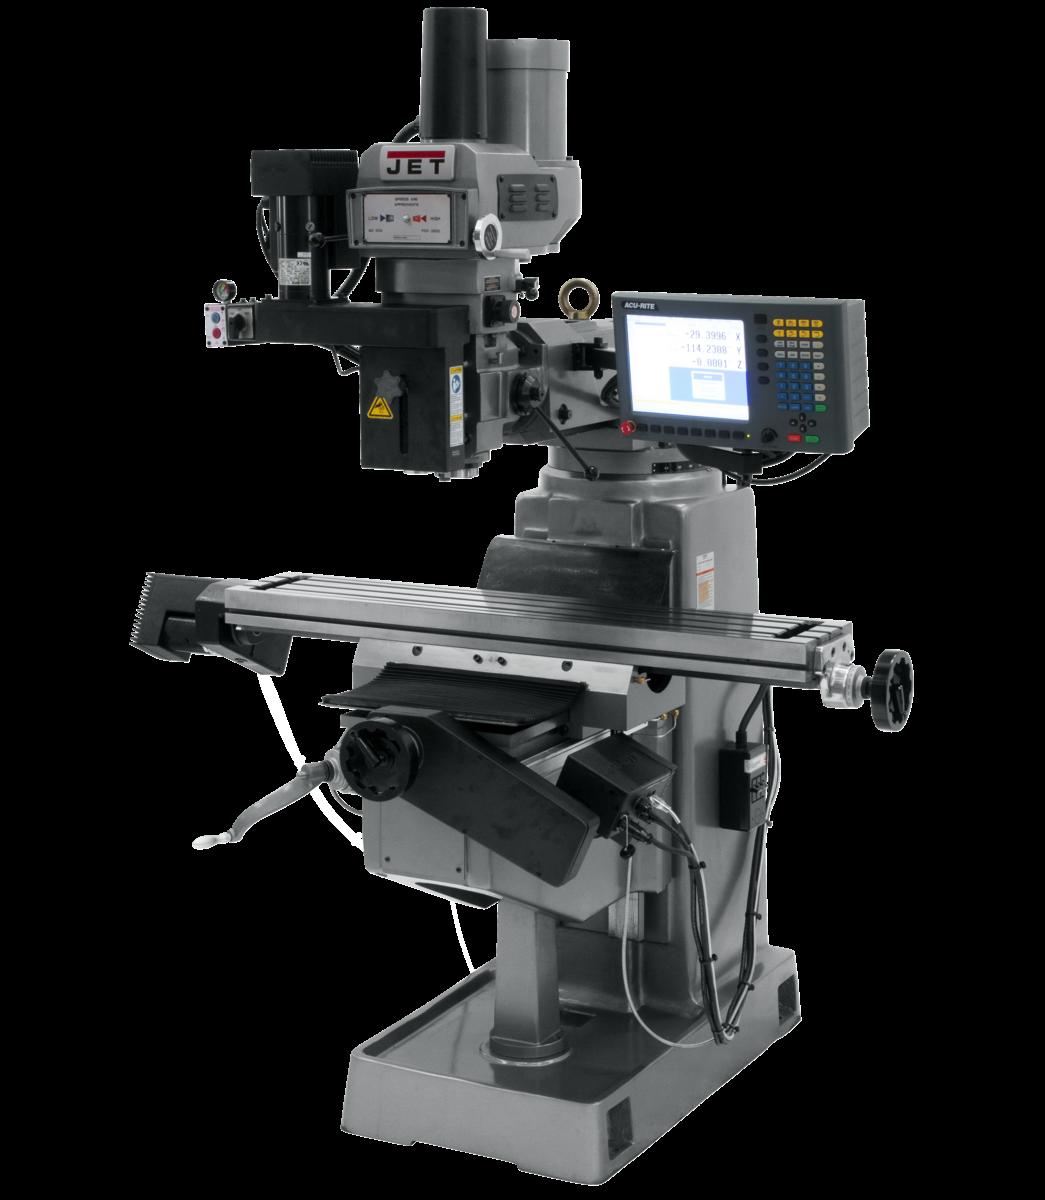 JTM-1050EVS CNC